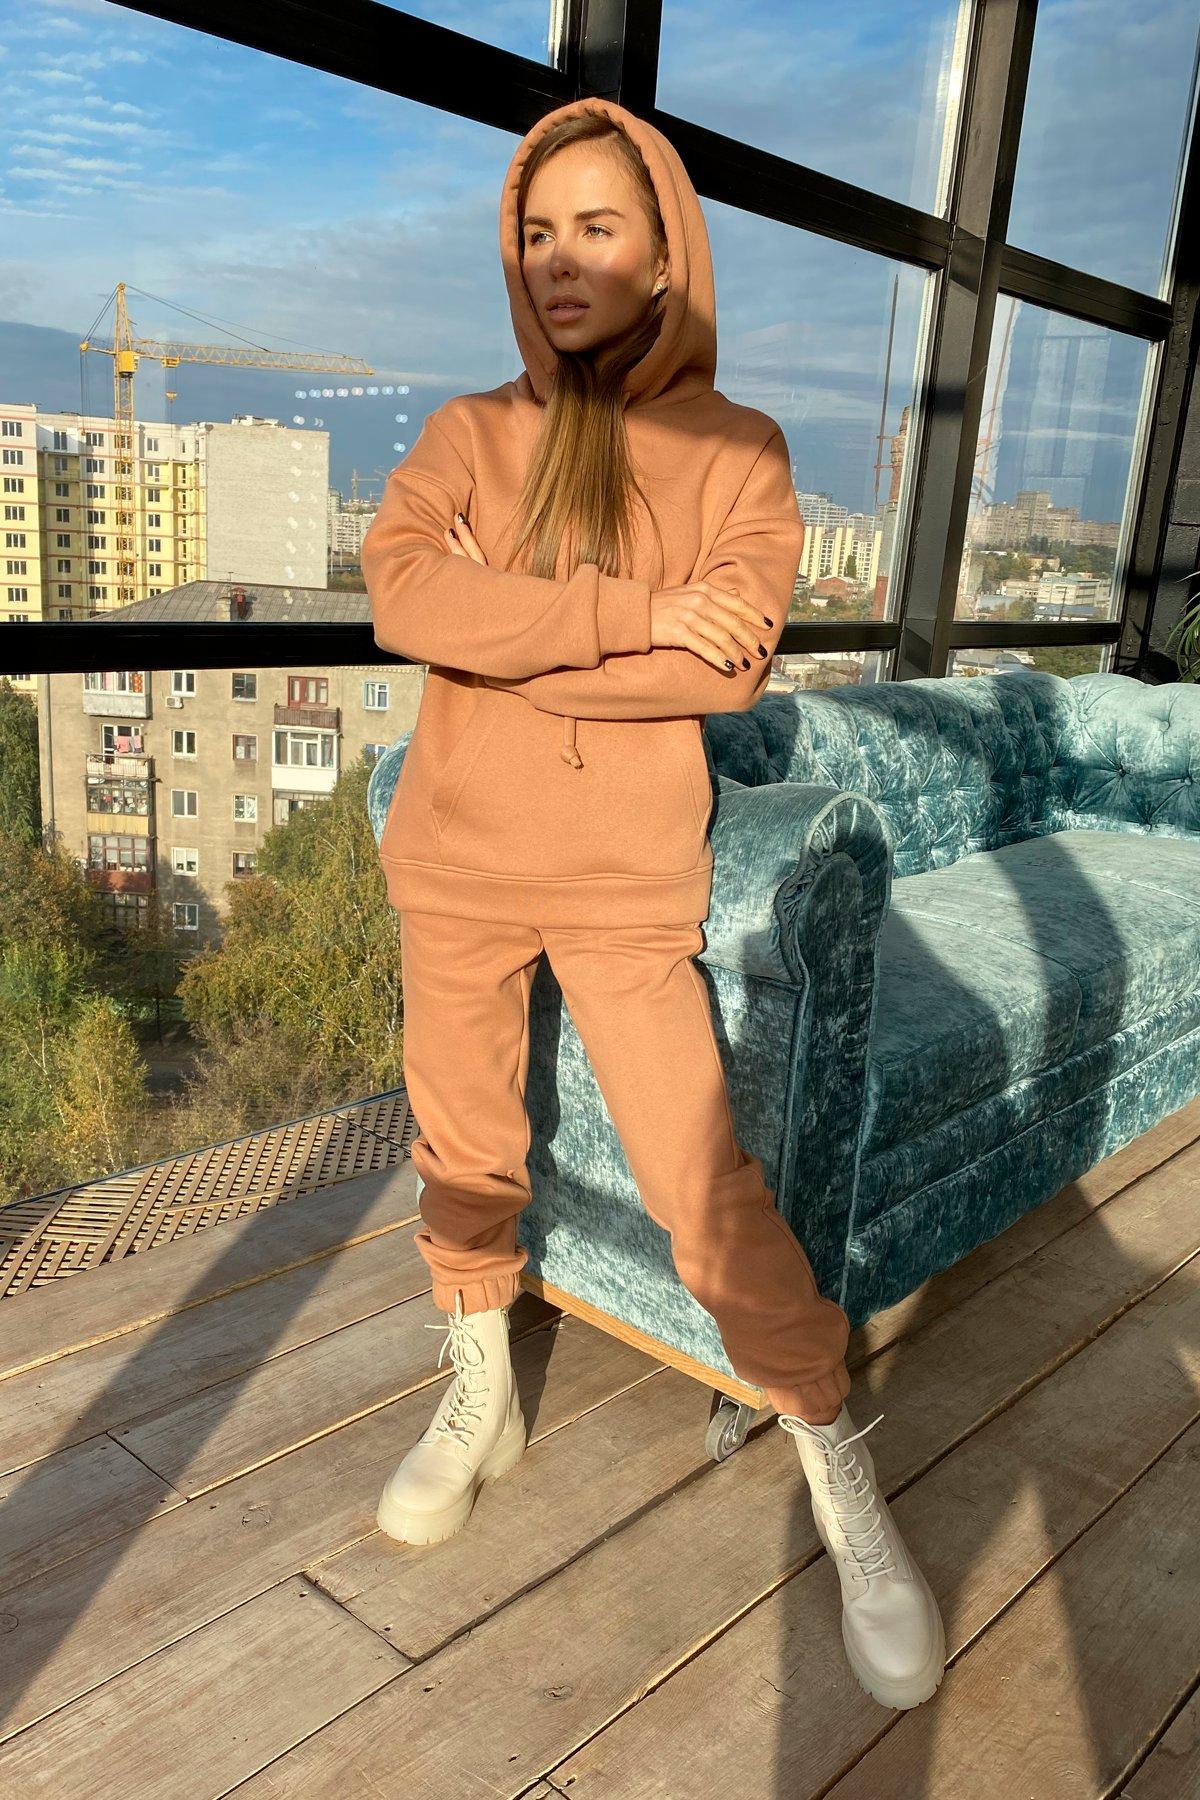 Кул трикотаж 3х нитка с начесом костюм 9981 АРТ. 46266 Цвет: Кемел - фото 3, интернет магазин tm-modus.ru